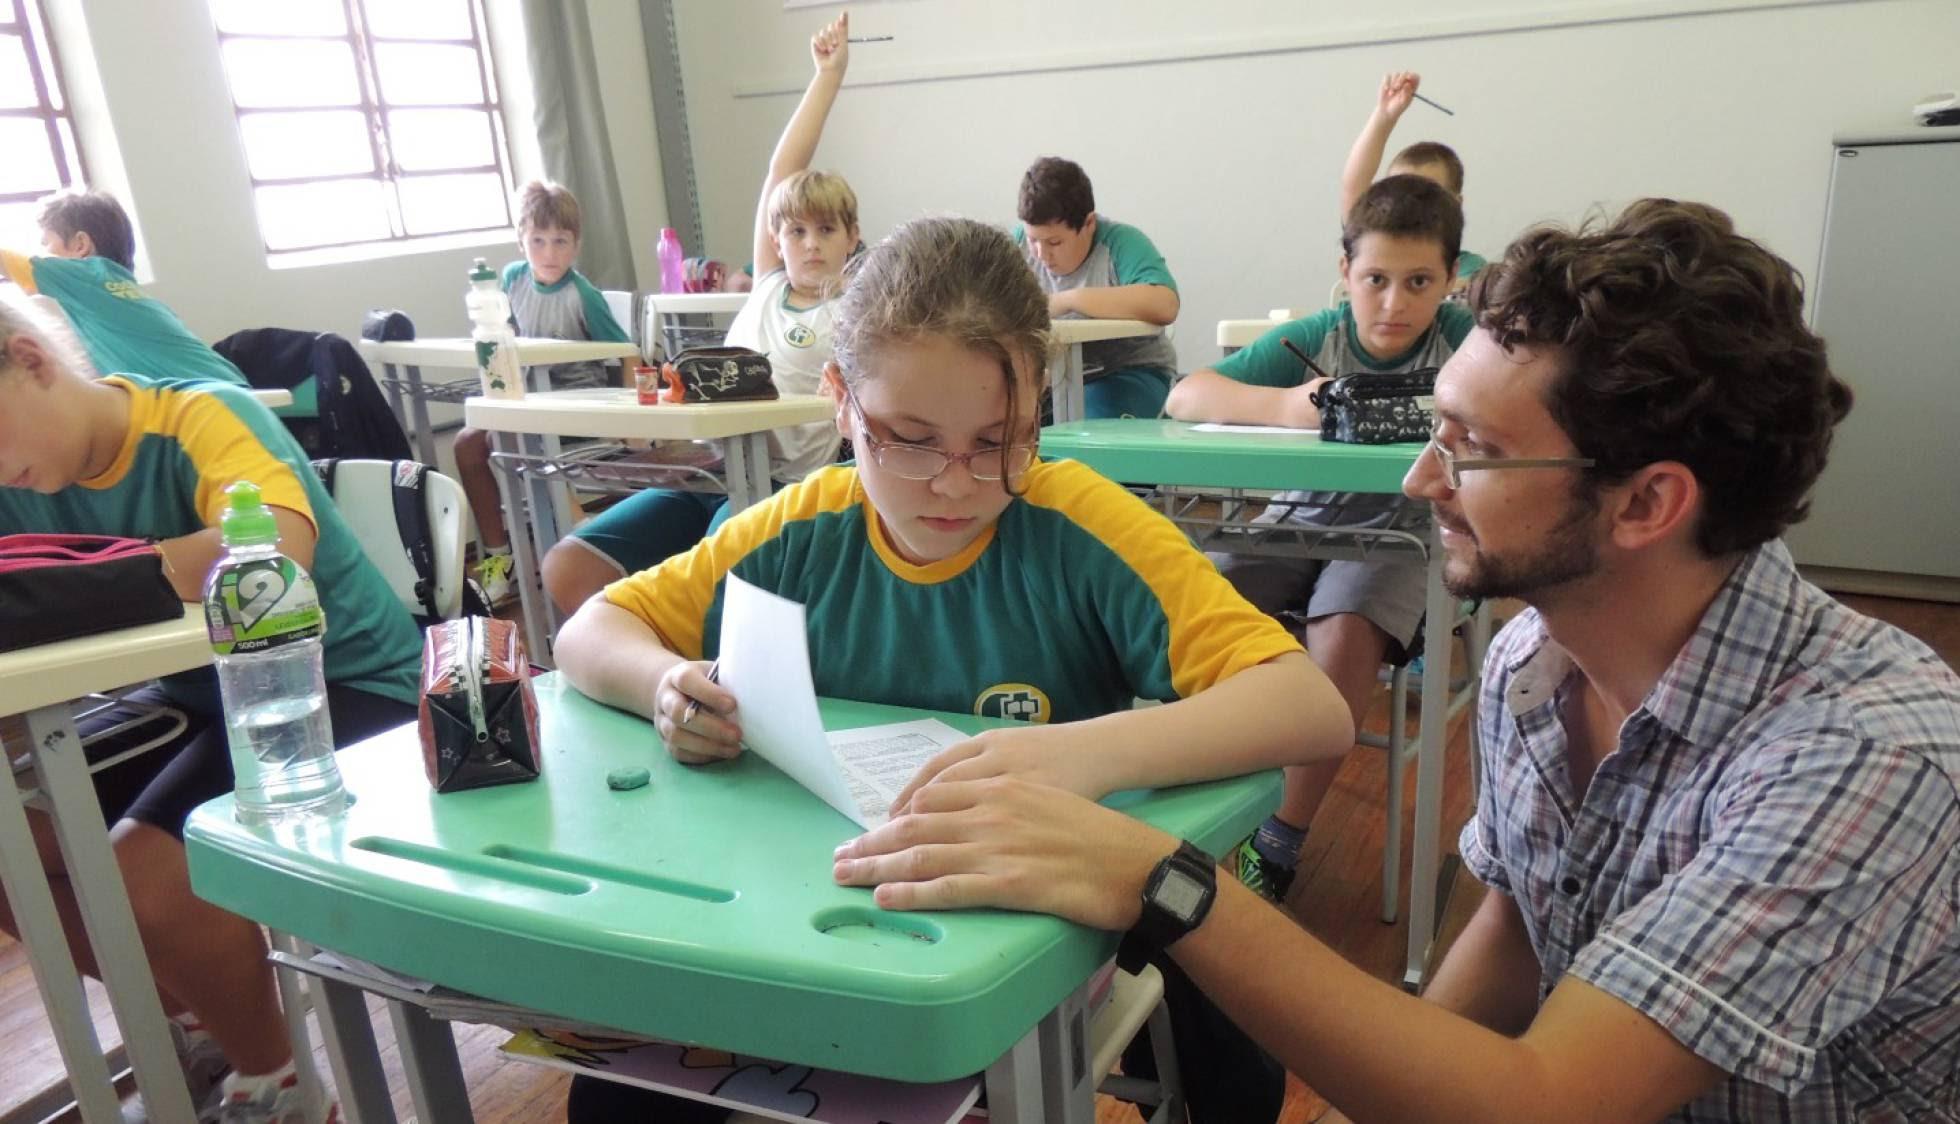 Professor cria método para ajudar aluno a aprender a estudar